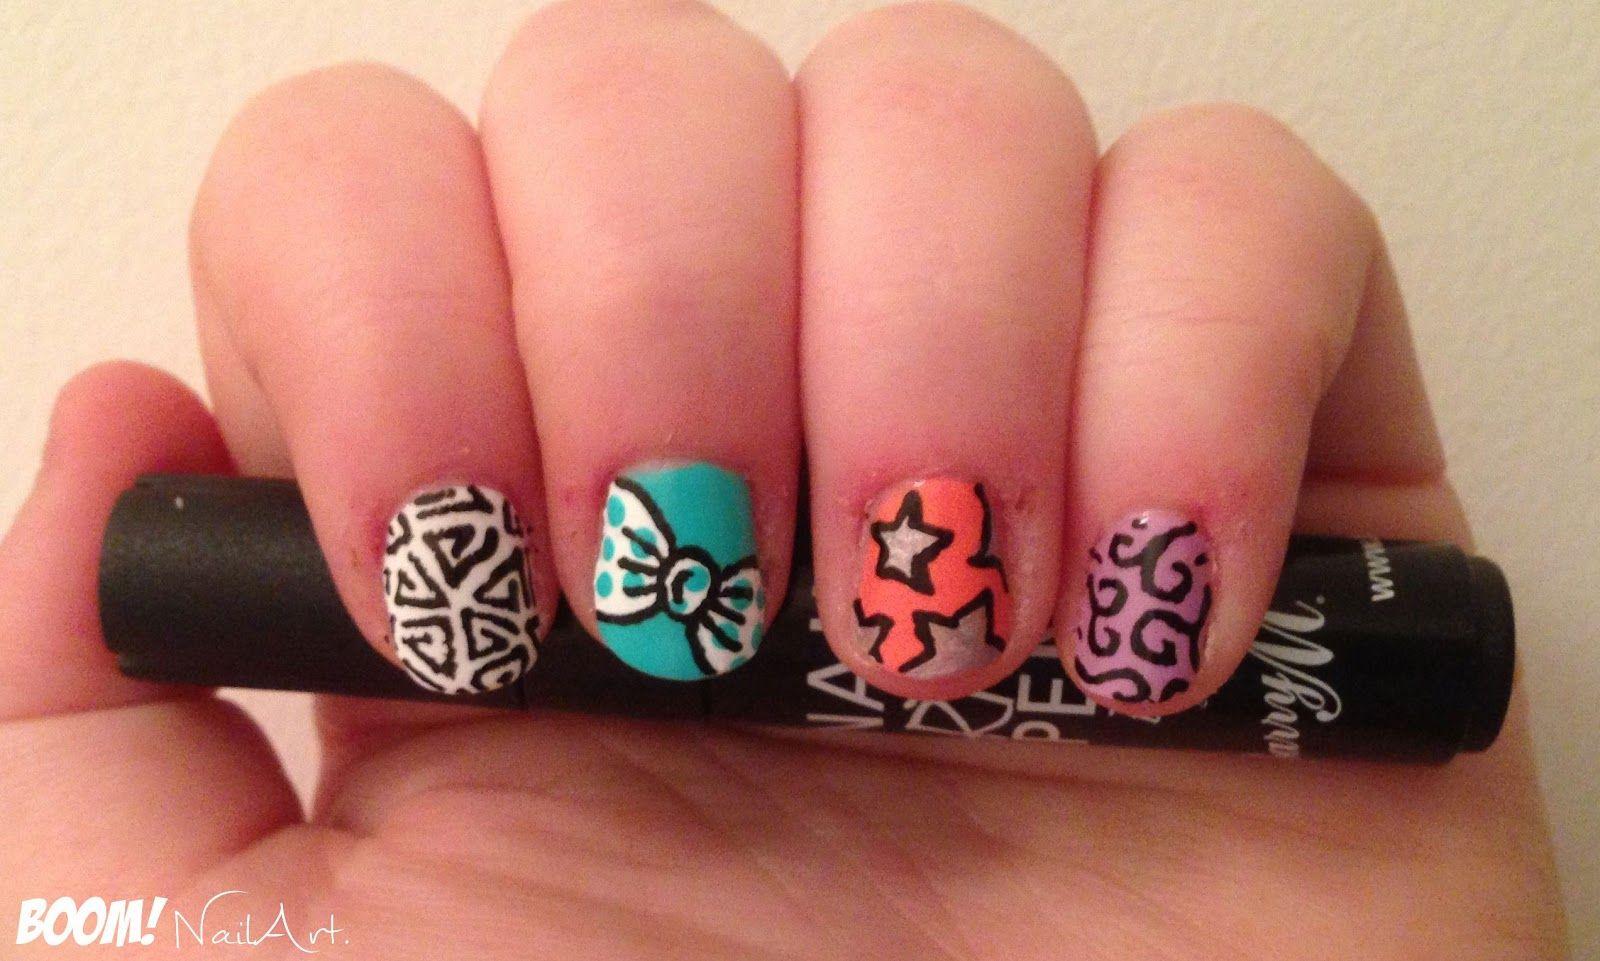 Designs Nail Art Pen Nail Design Ideas 2015 Migi Nail Art Design